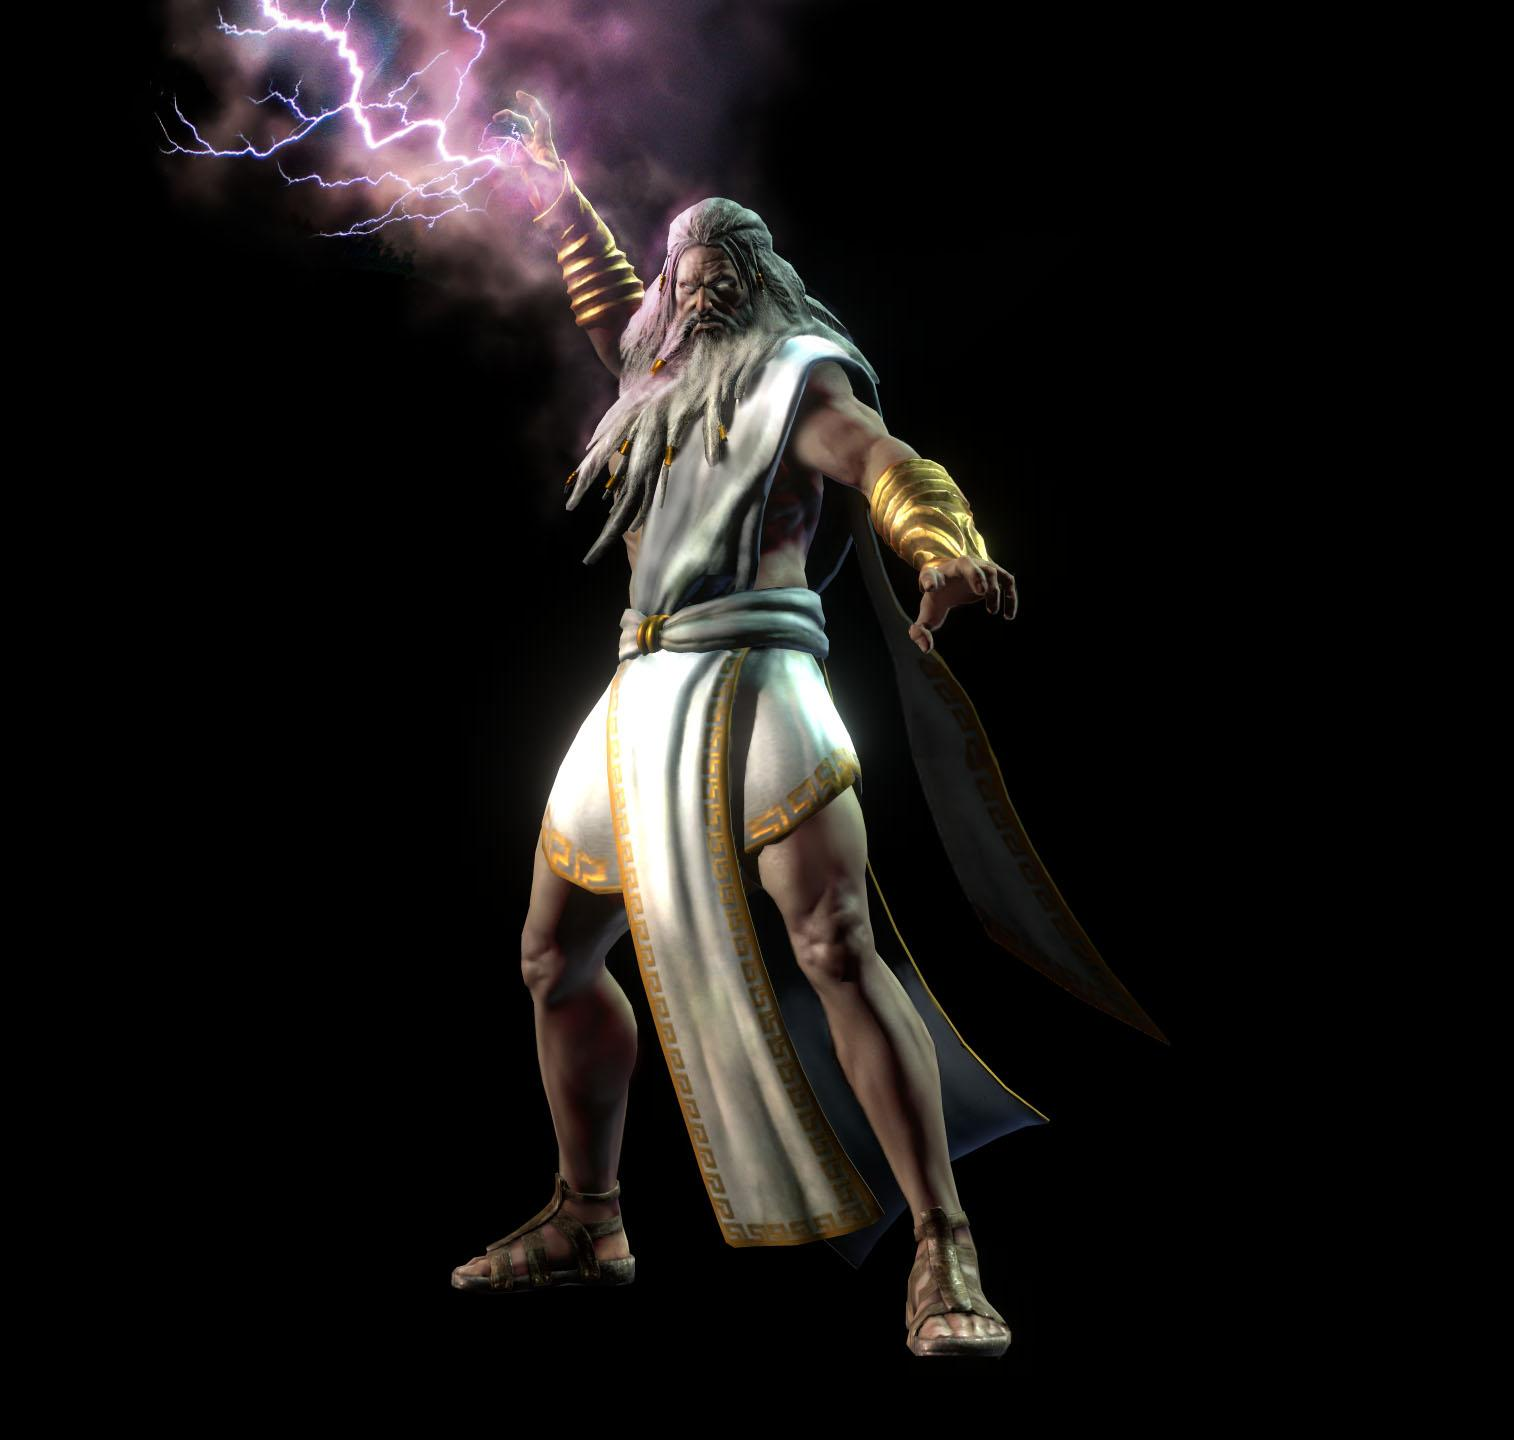 image god of war 3 zeus jpg antagonists wiki fandom powered